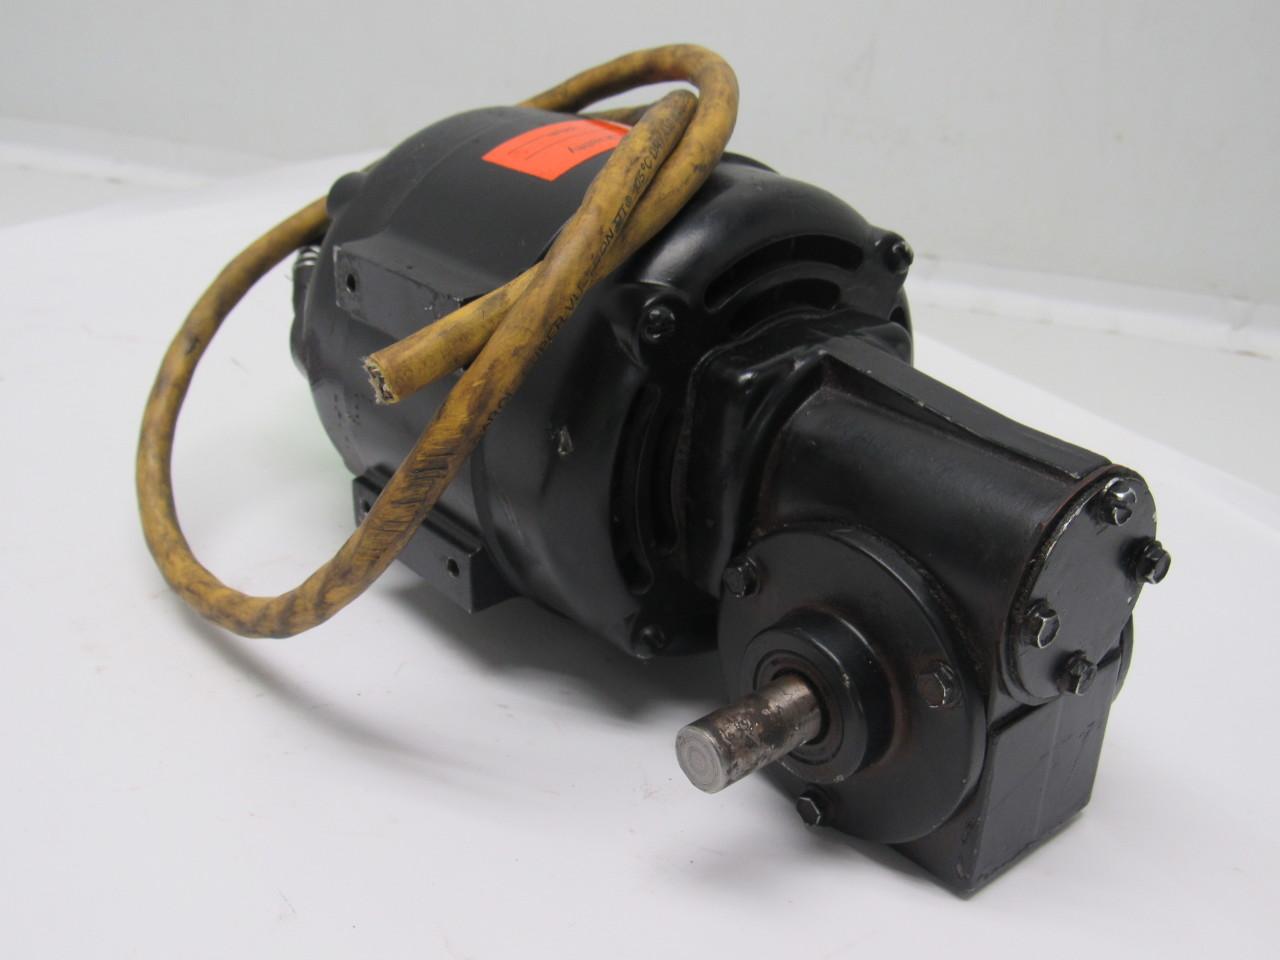 Bodine Nsi 33r 1 20hp 230v 345rpm 5 1 Ratio Electric Gear